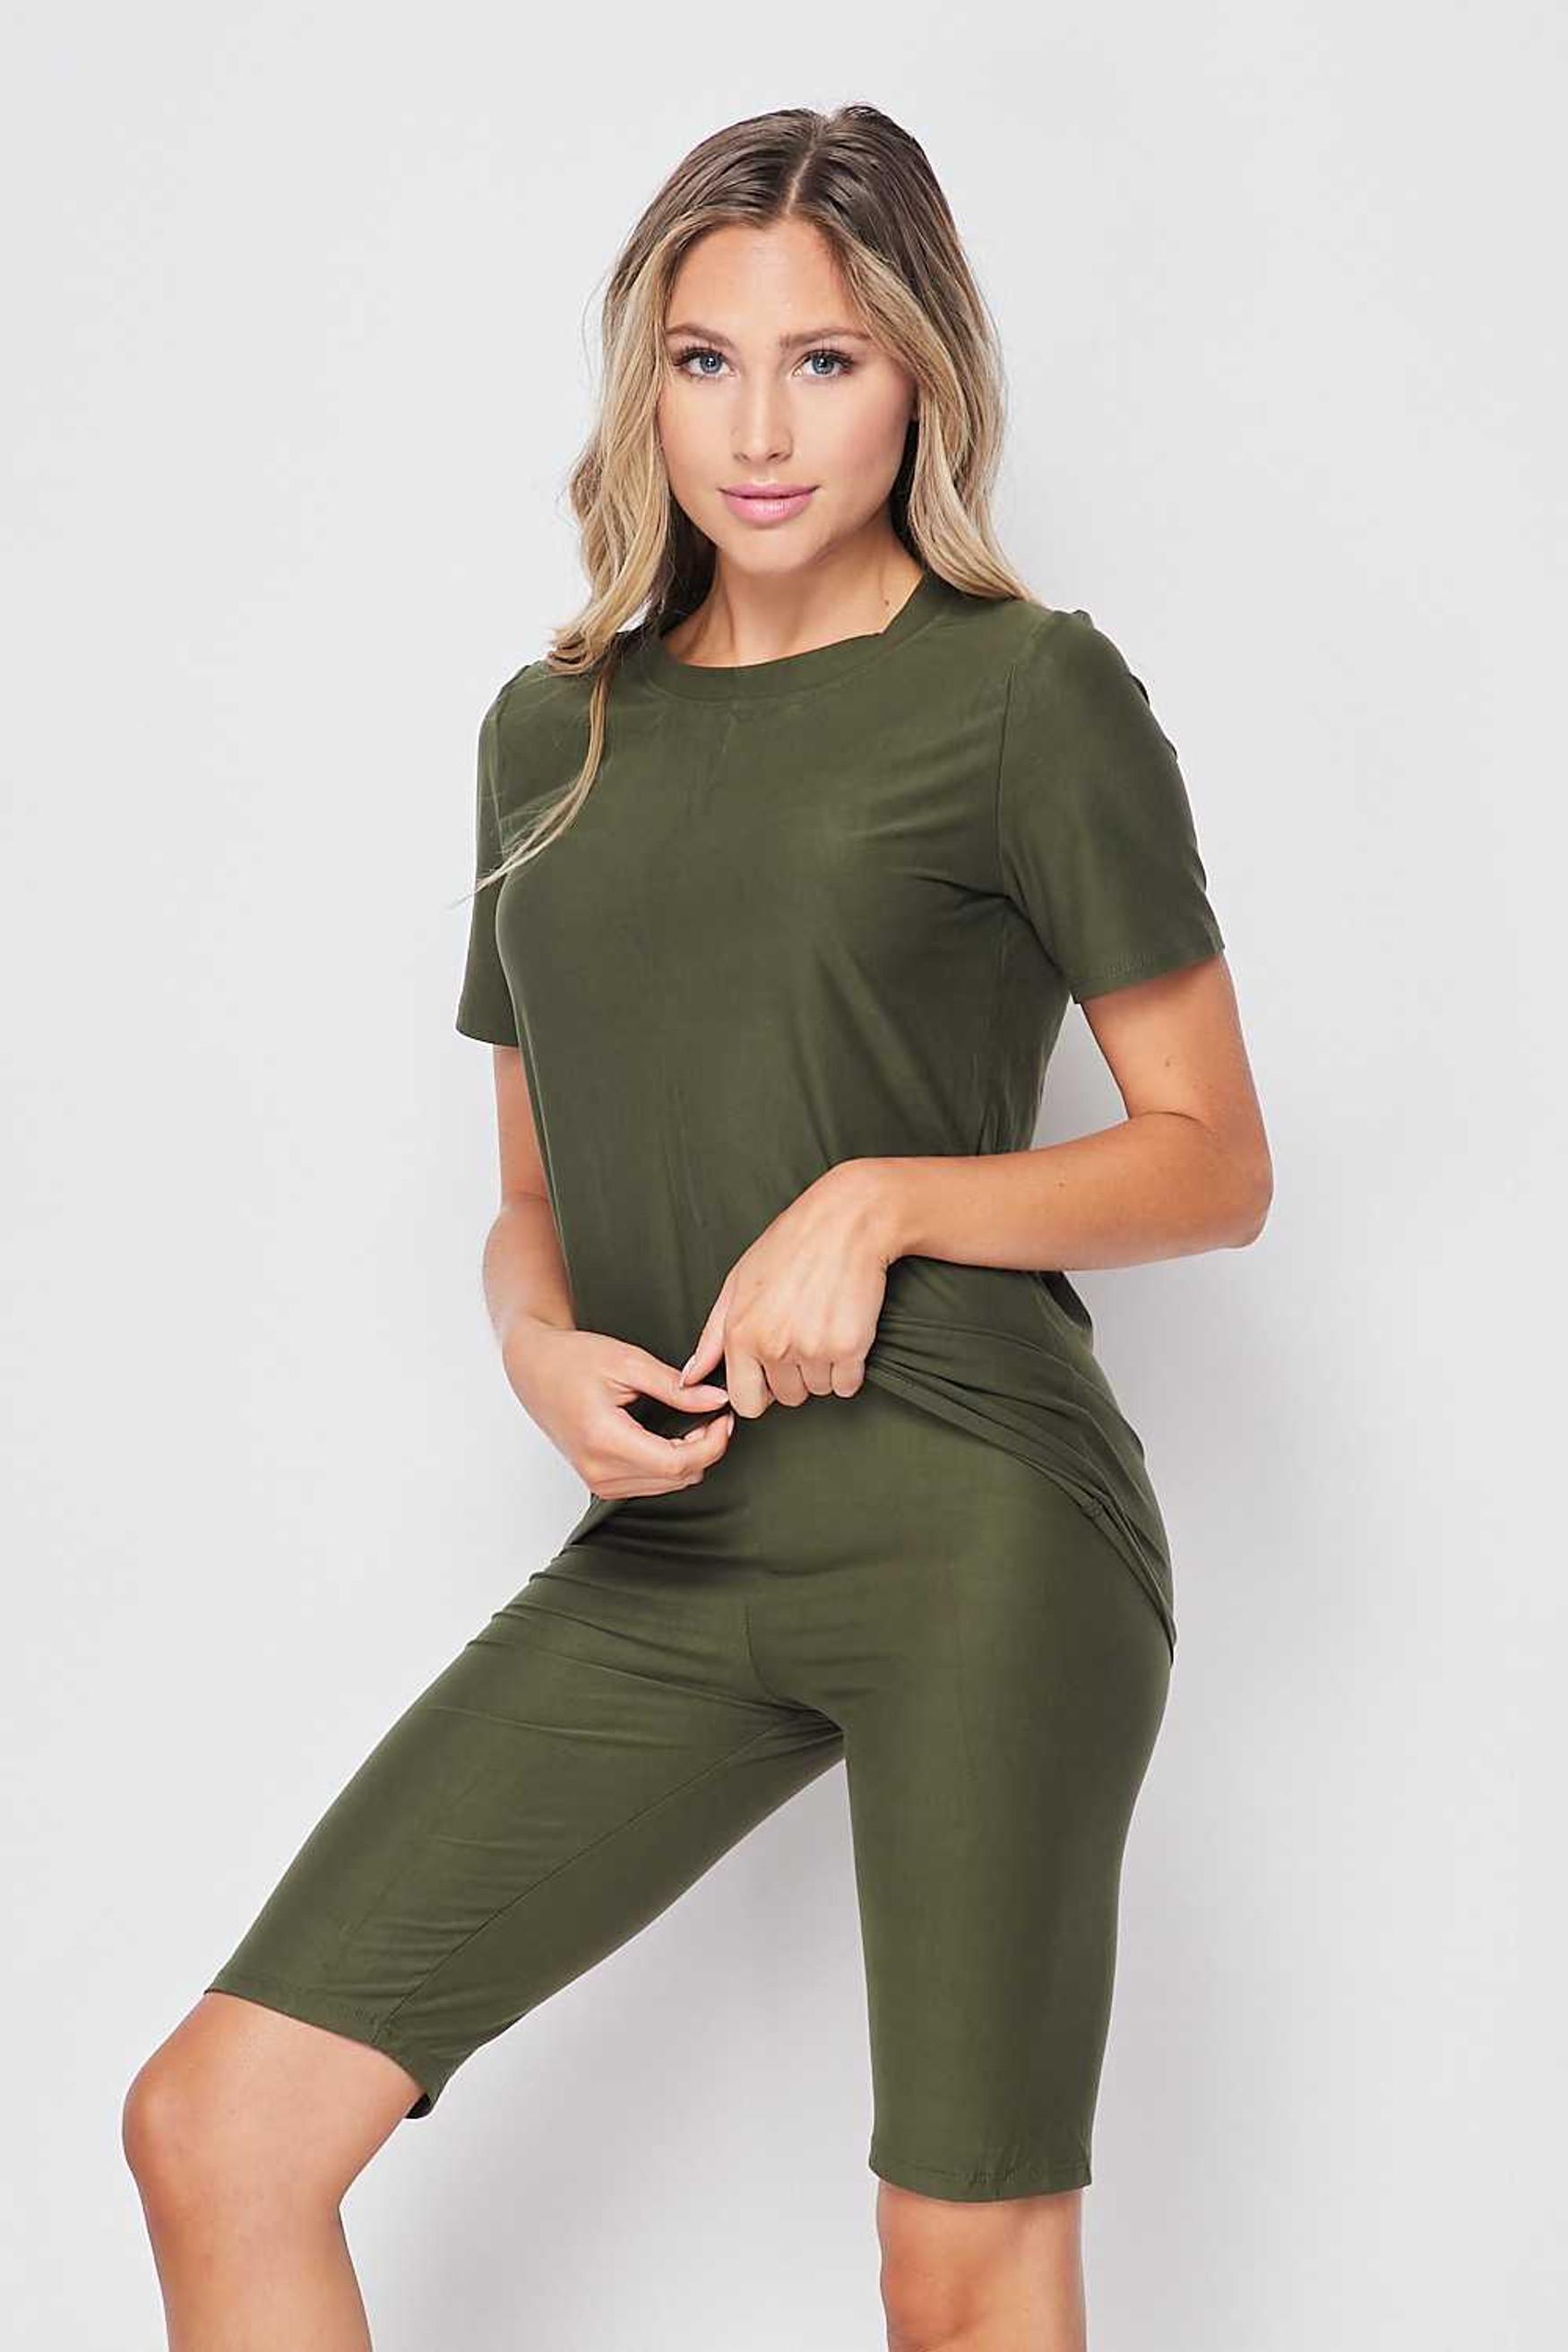 Left side of Olive Buttery Soft Basic Solid Biker Shorts and T-Shirt Set